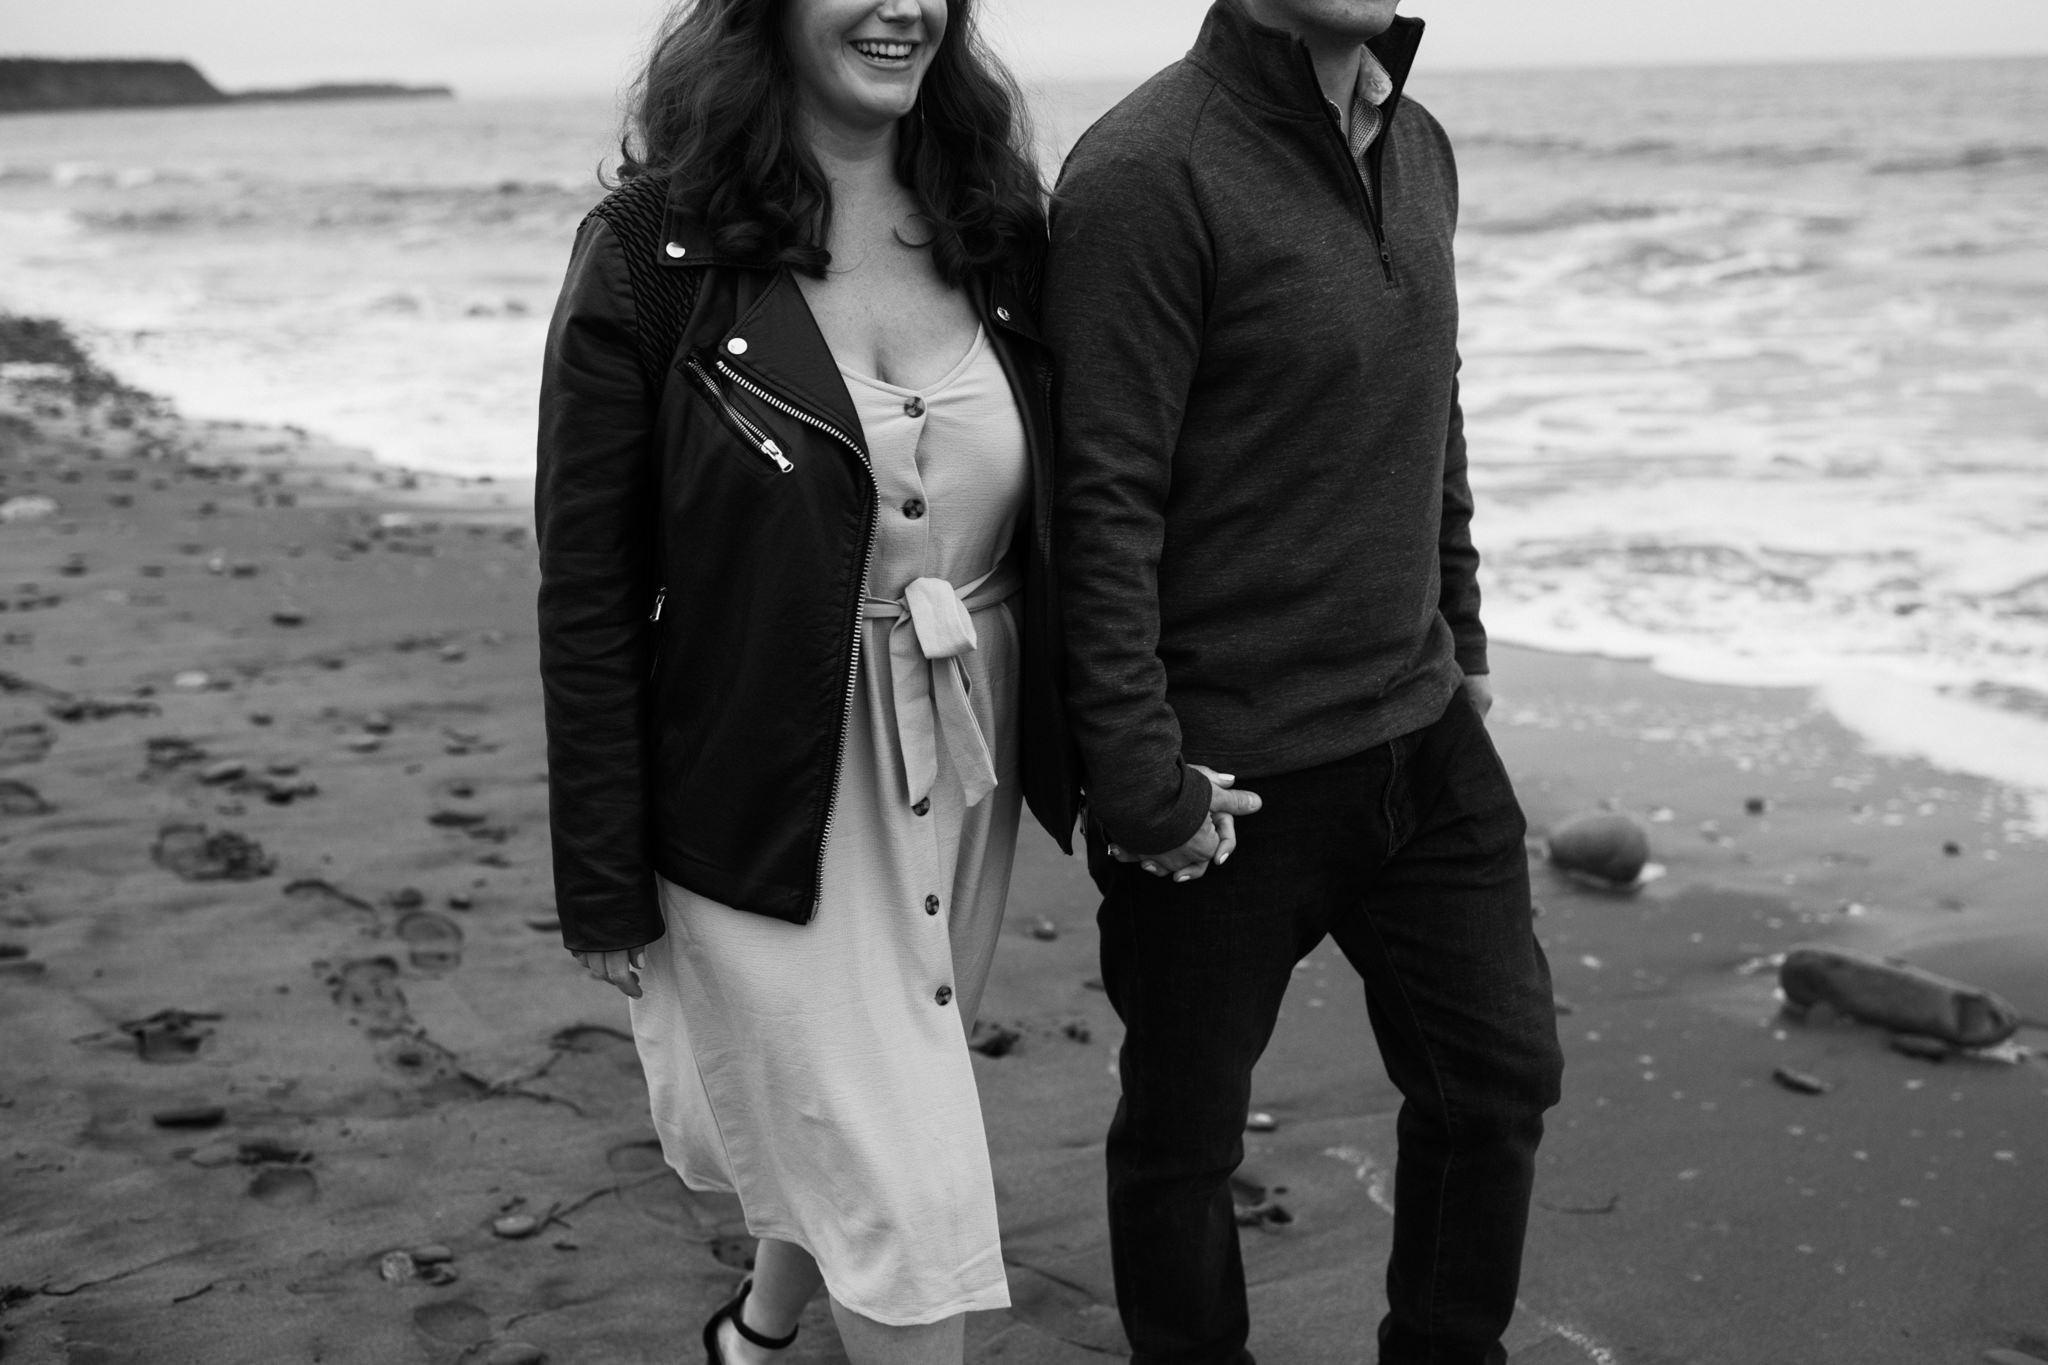 147-moody-lawrencetown-beach-nova-scotia-wedding-photographer-toronto.jpg